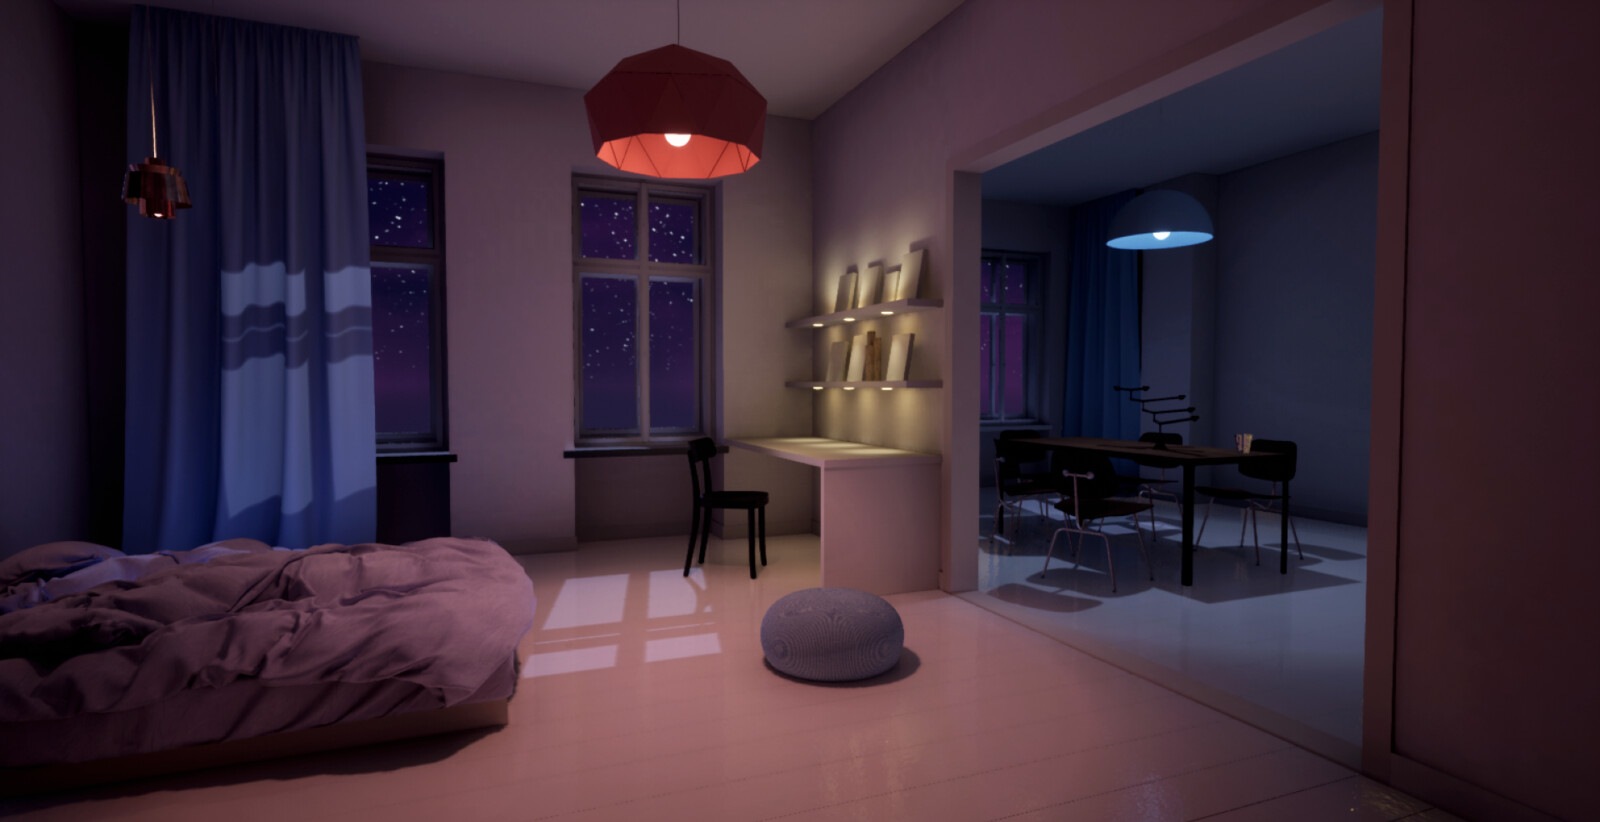 The Night Investigation - Night2